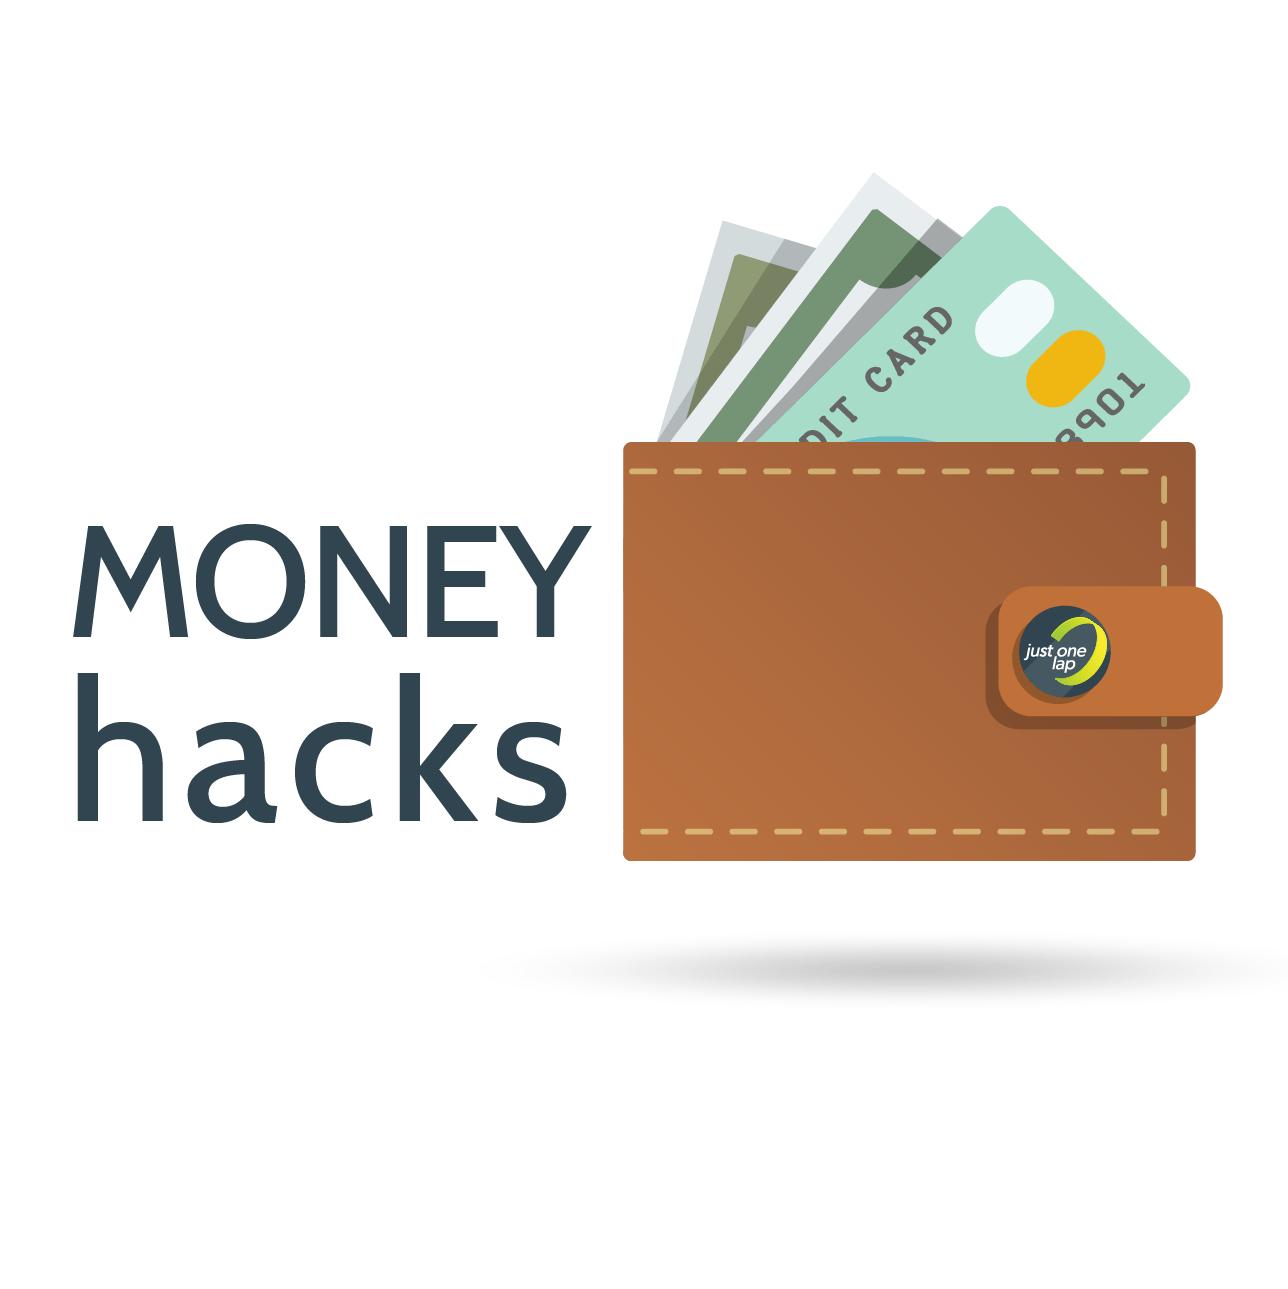 Money Hacks: Insurance review case study